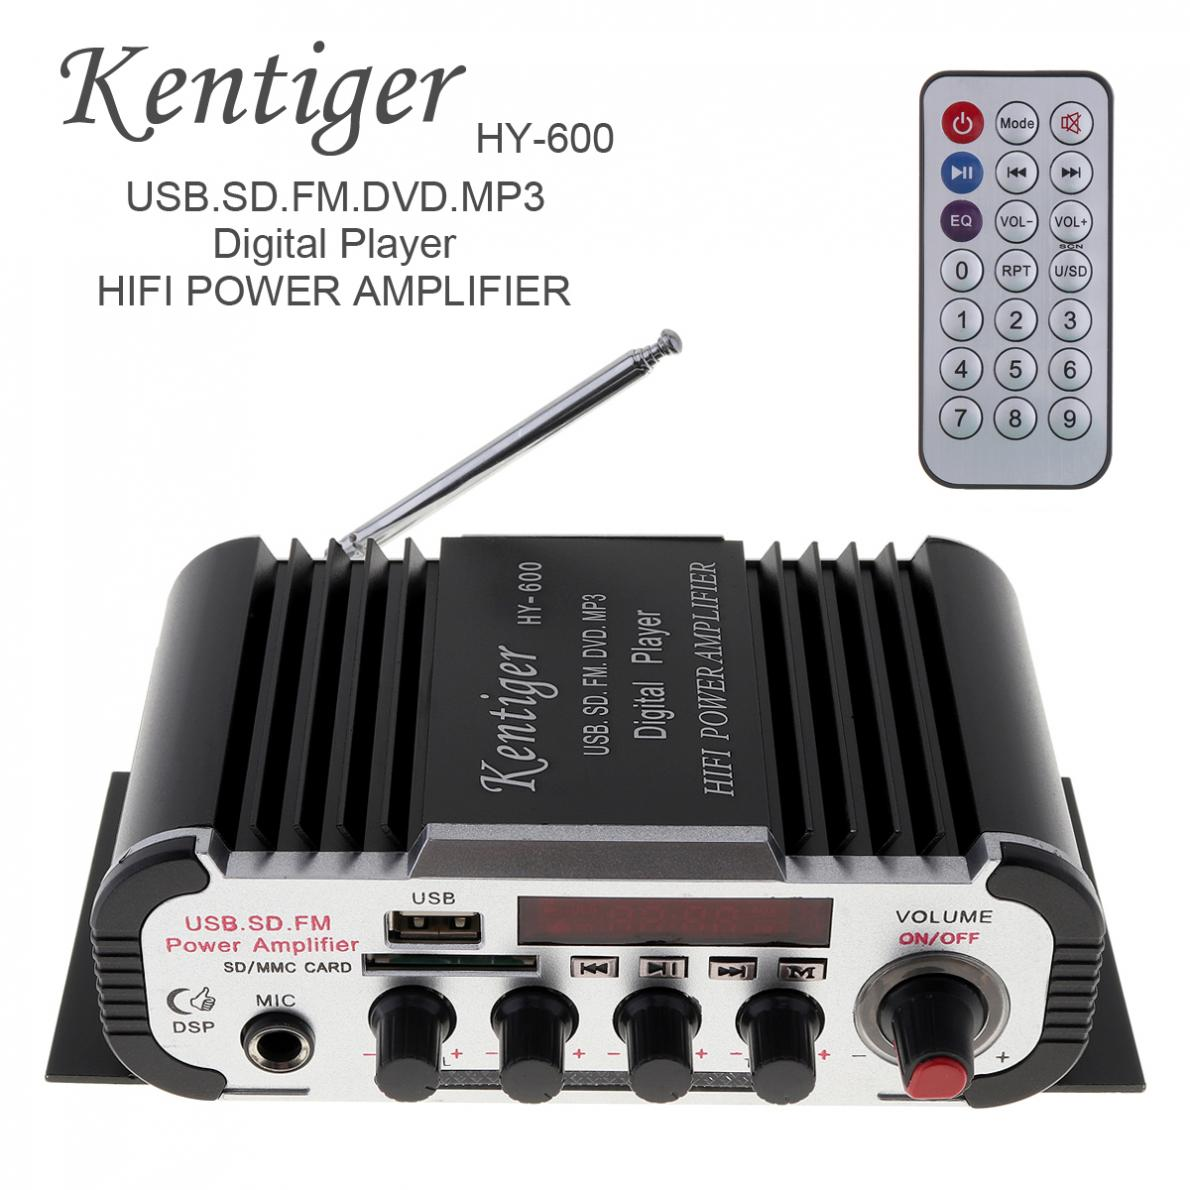 Kentiger HY-600 2CH HI-FI Car Audio Power Amplifier FM Radio USB MP3 Stereo Digital Player Support U disk SD / MMC card